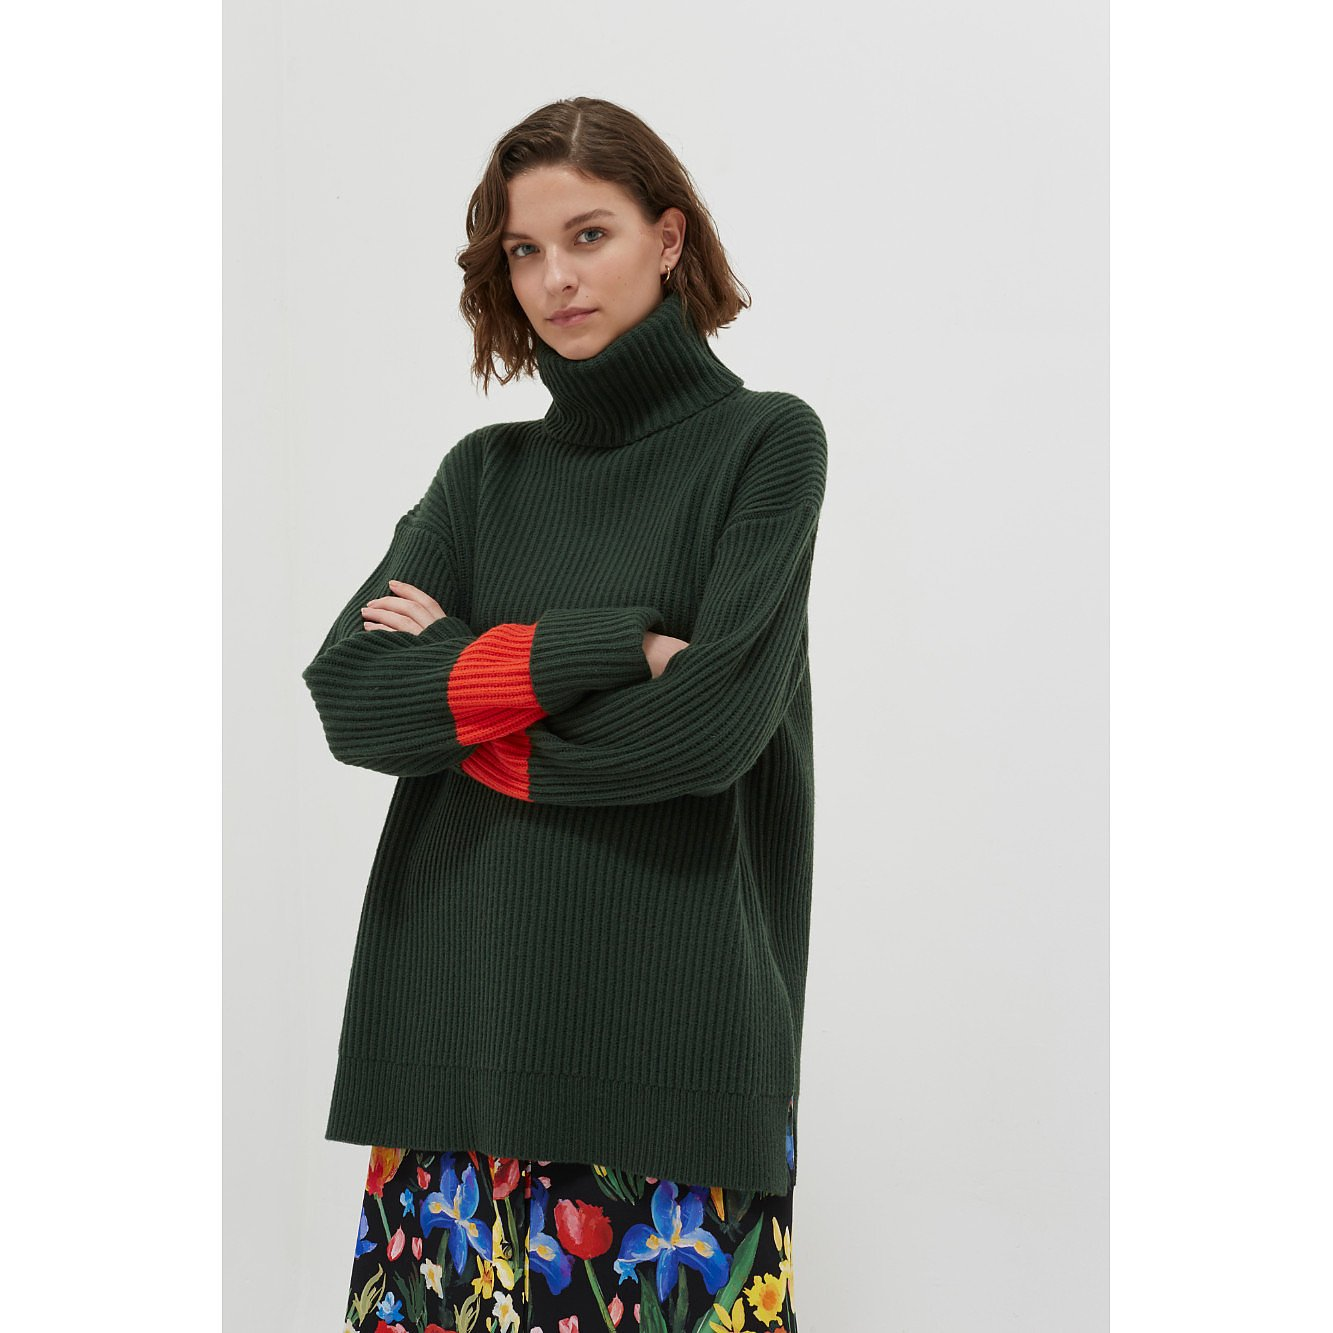 Chinti and Parker Rib Merino Wool Rollneck Sweater